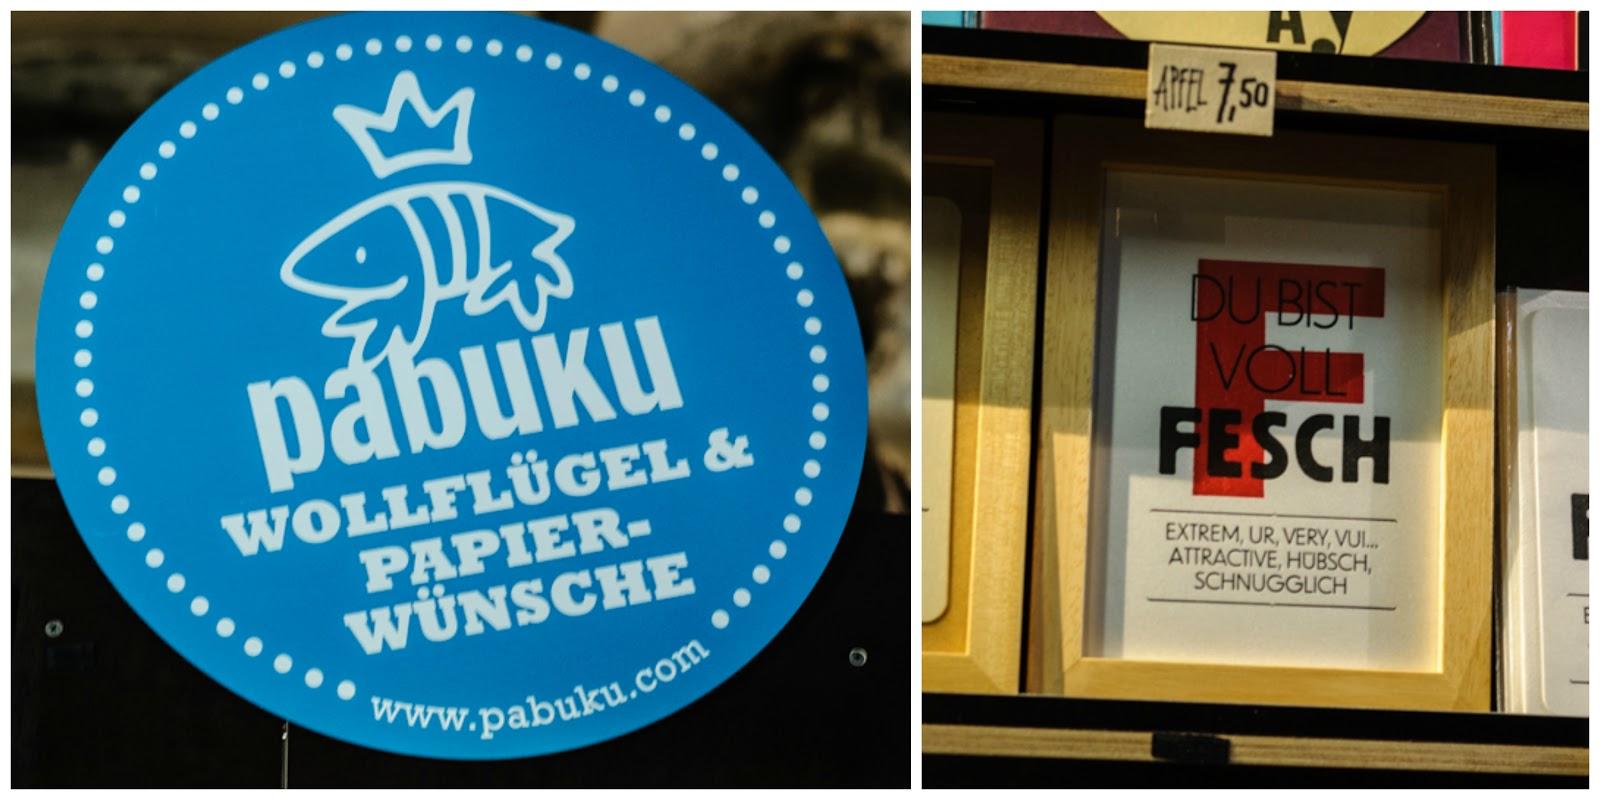 Feschmarkt-Designmarkt | Ottakringer Brauerei | pabaku - pigugi.blogspot.com